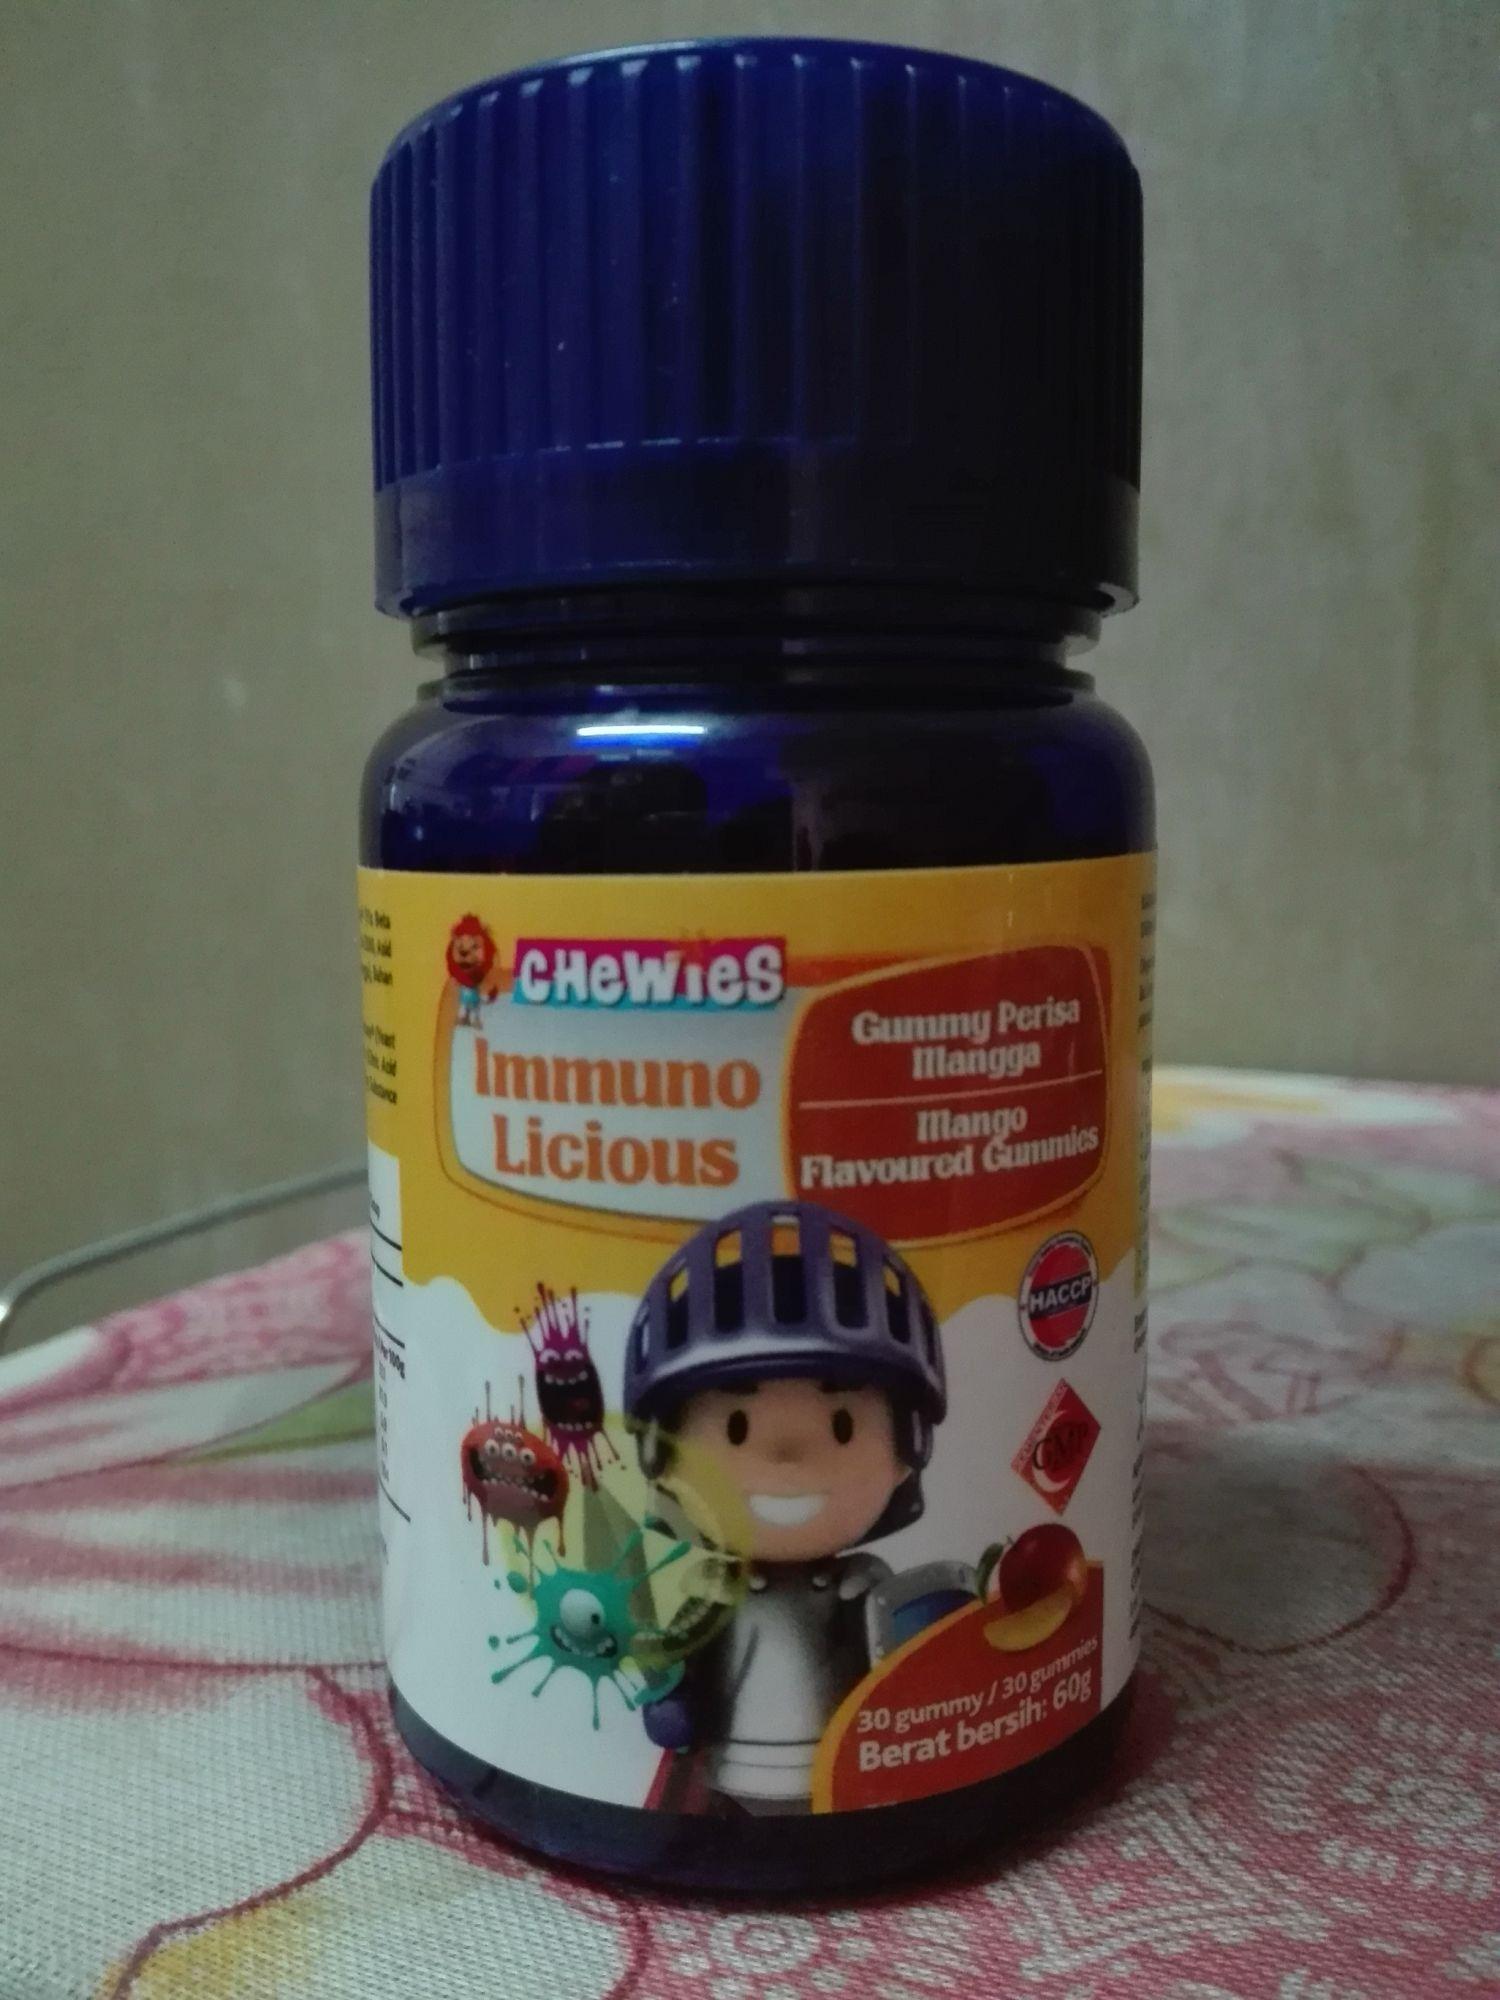 Chewies Immuno Licious Reviews Wellness Gummy Kids 30 Gummies Bentuk Jelly Yang Menarik Kanak